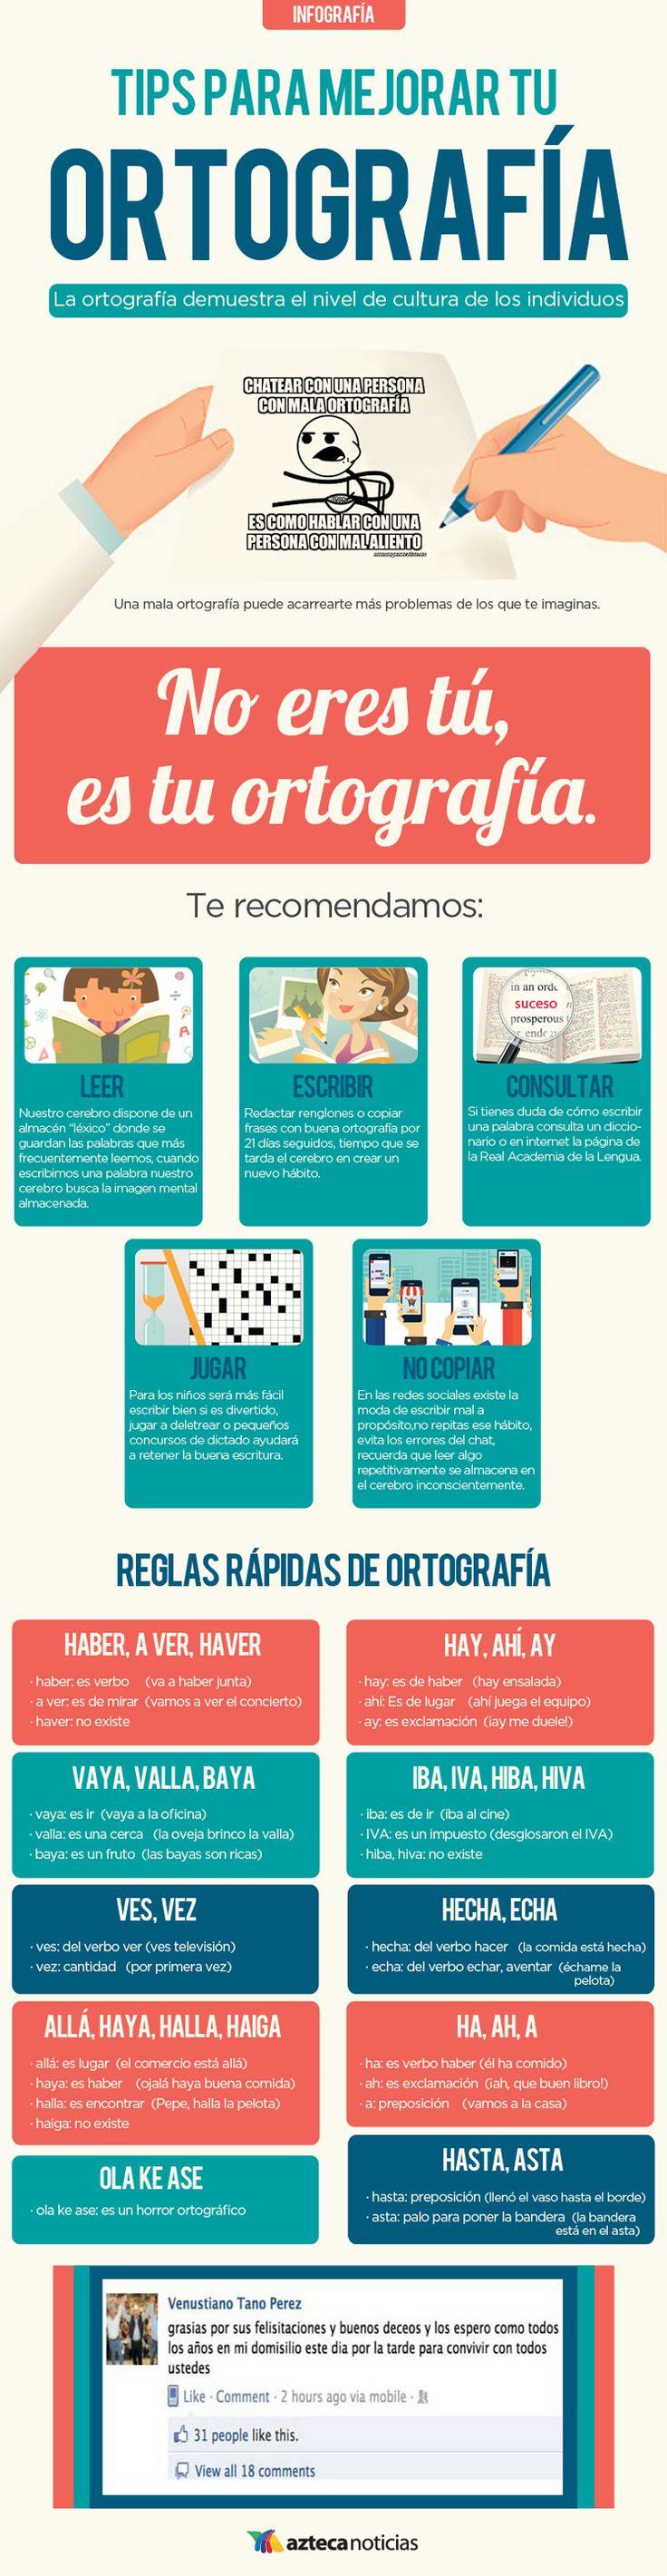 Tips para mejorar tu ortografía #infografia